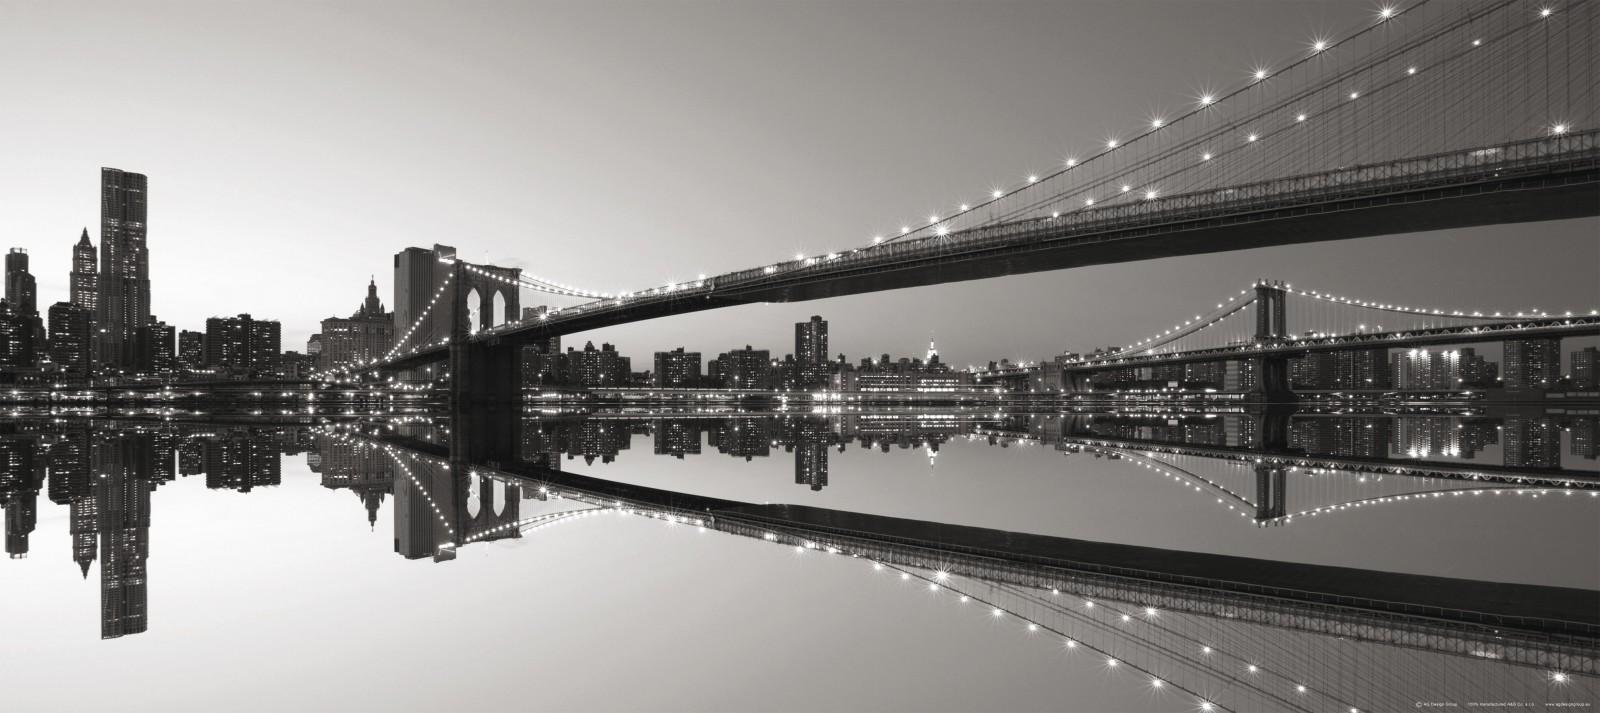 fototapete tapete br cke brooklyn bridge new york nyc. Black Bedroom Furniture Sets. Home Design Ideas